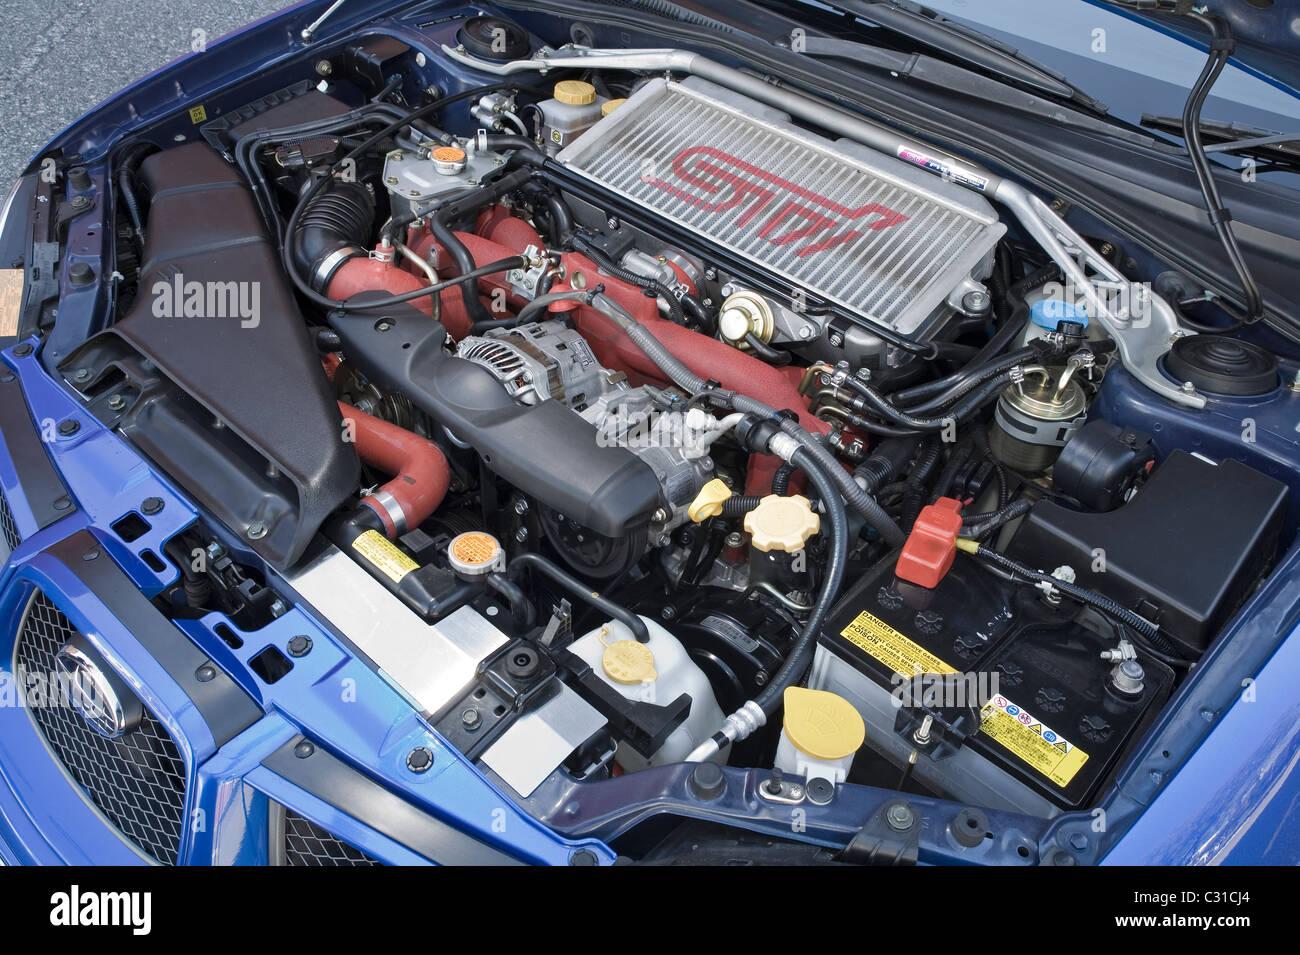 Subaru Impreza Wrx Engine Stockfotos Und Bilder Kaufen Alamy